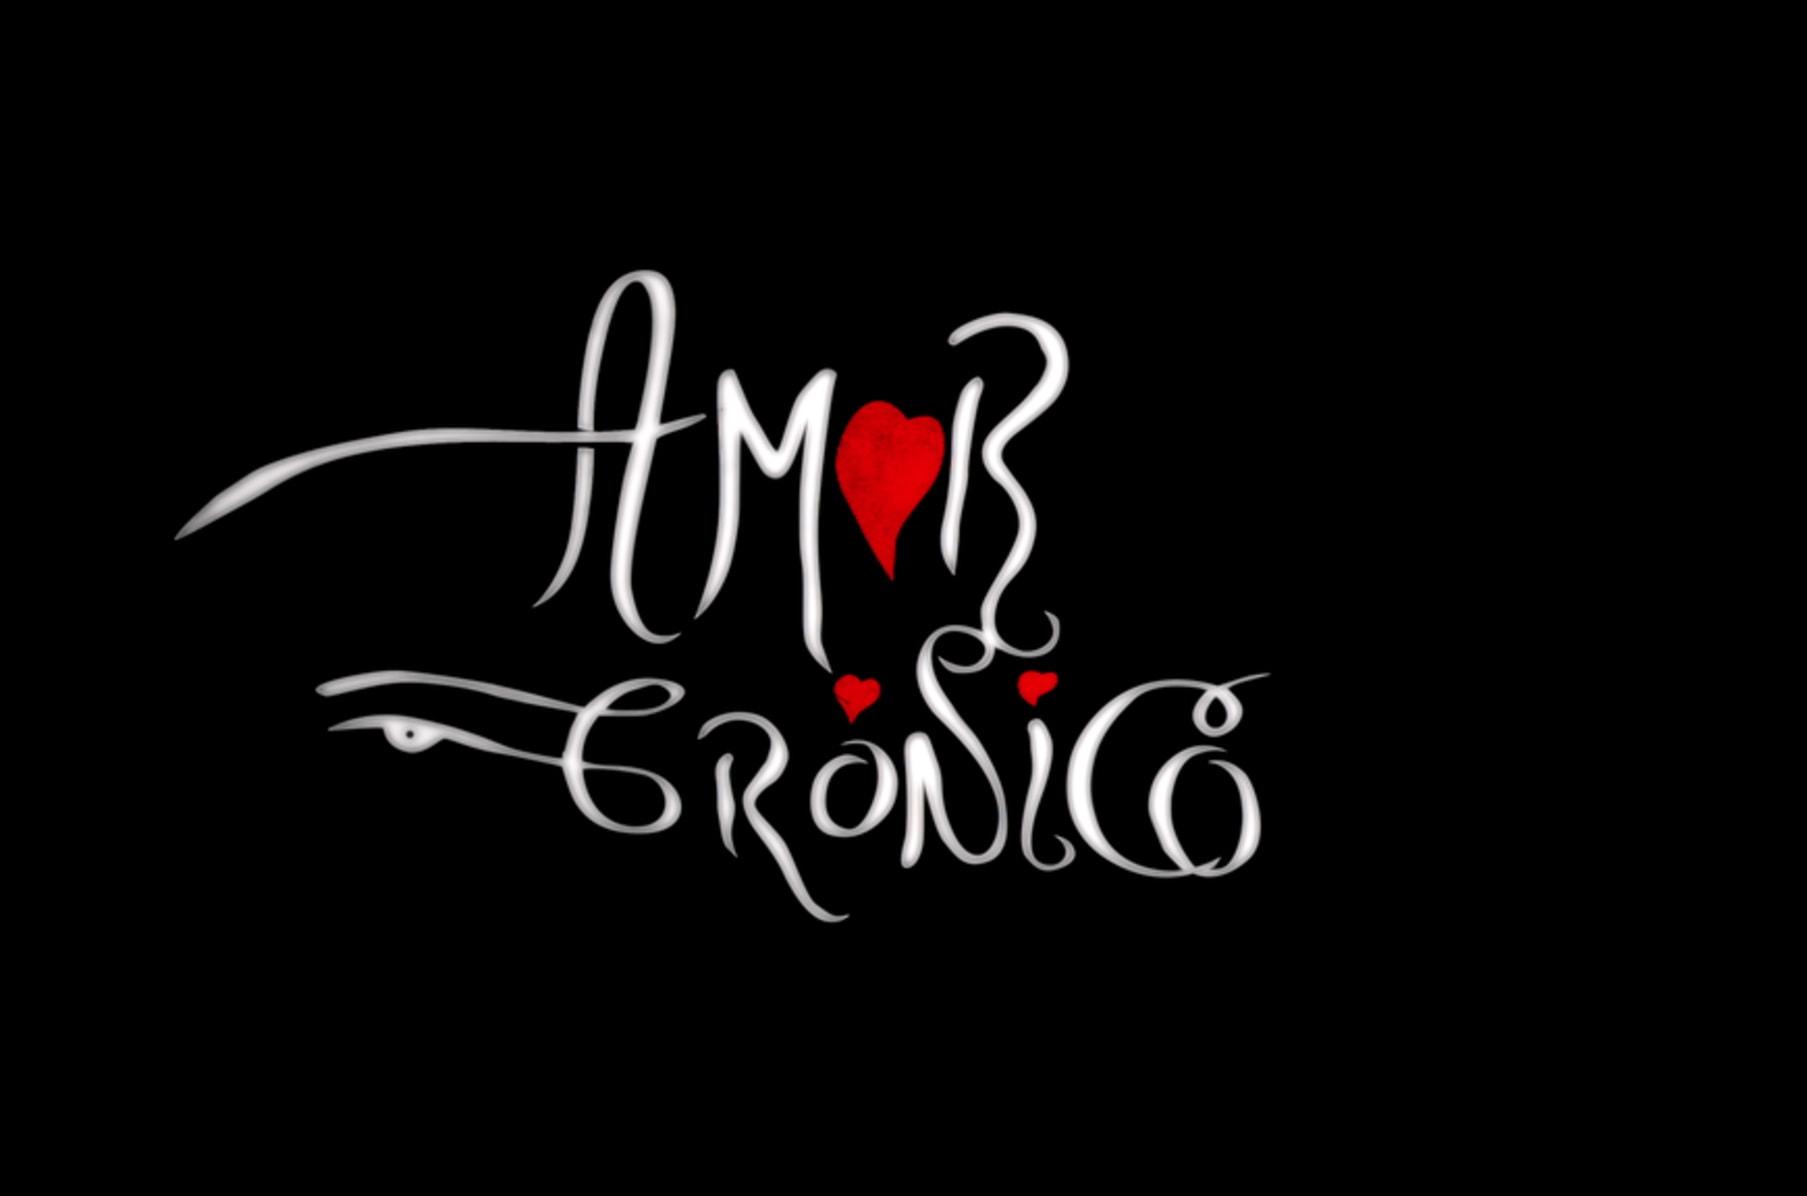 Amor En Fin Movie Online amor cronico starring cucu diamantes | indiegogo